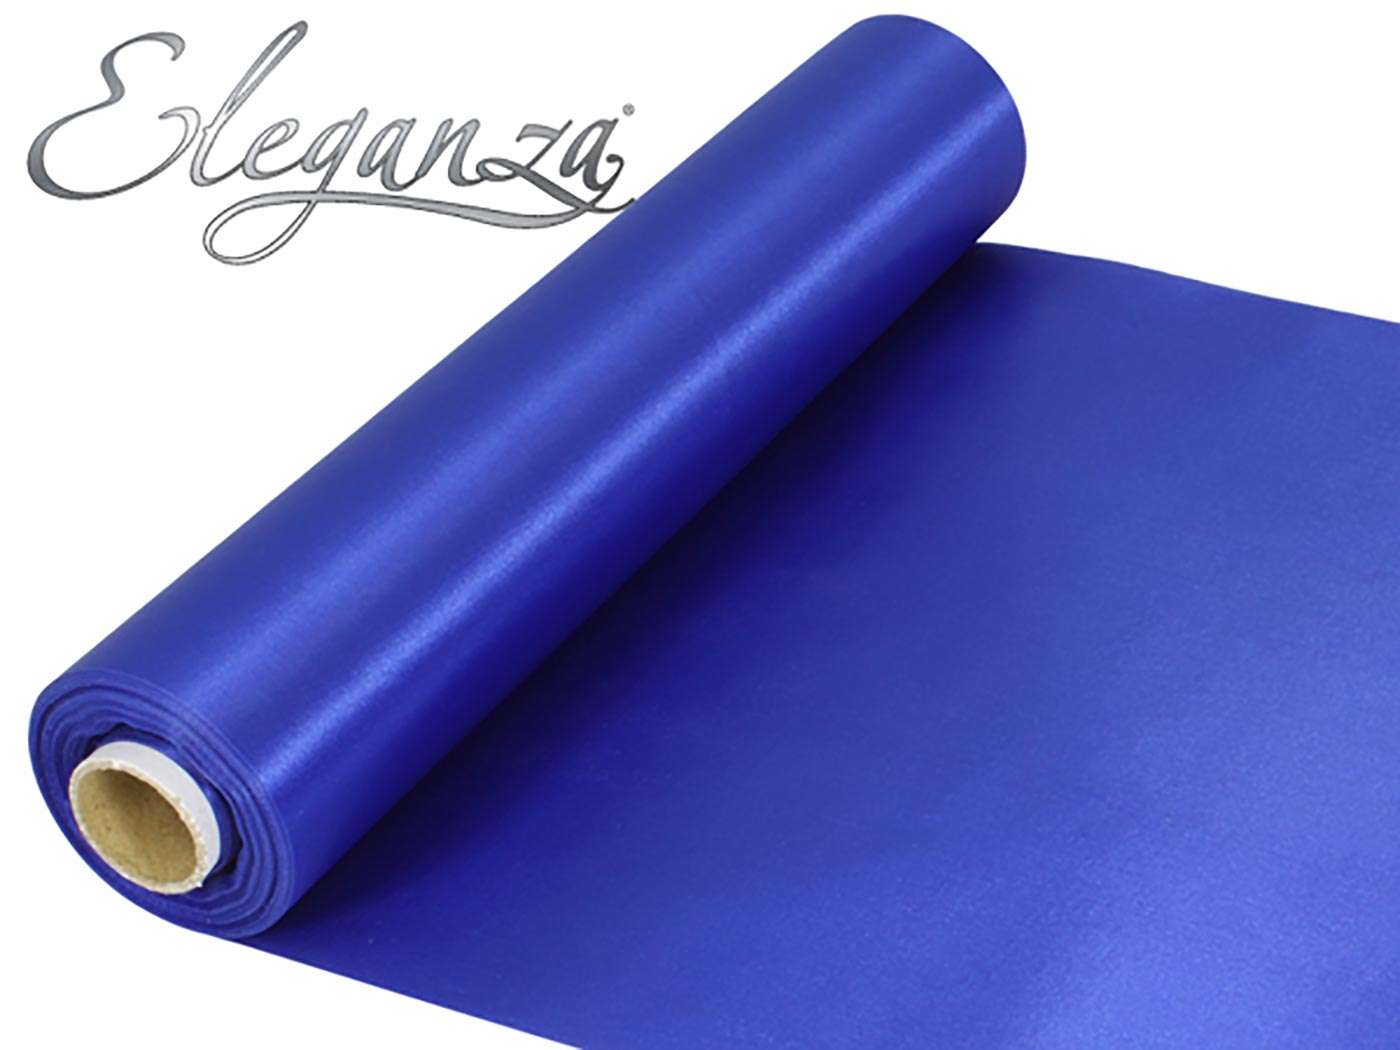 Eleganza Satin Fabric 29cm x 20m Royal Blue